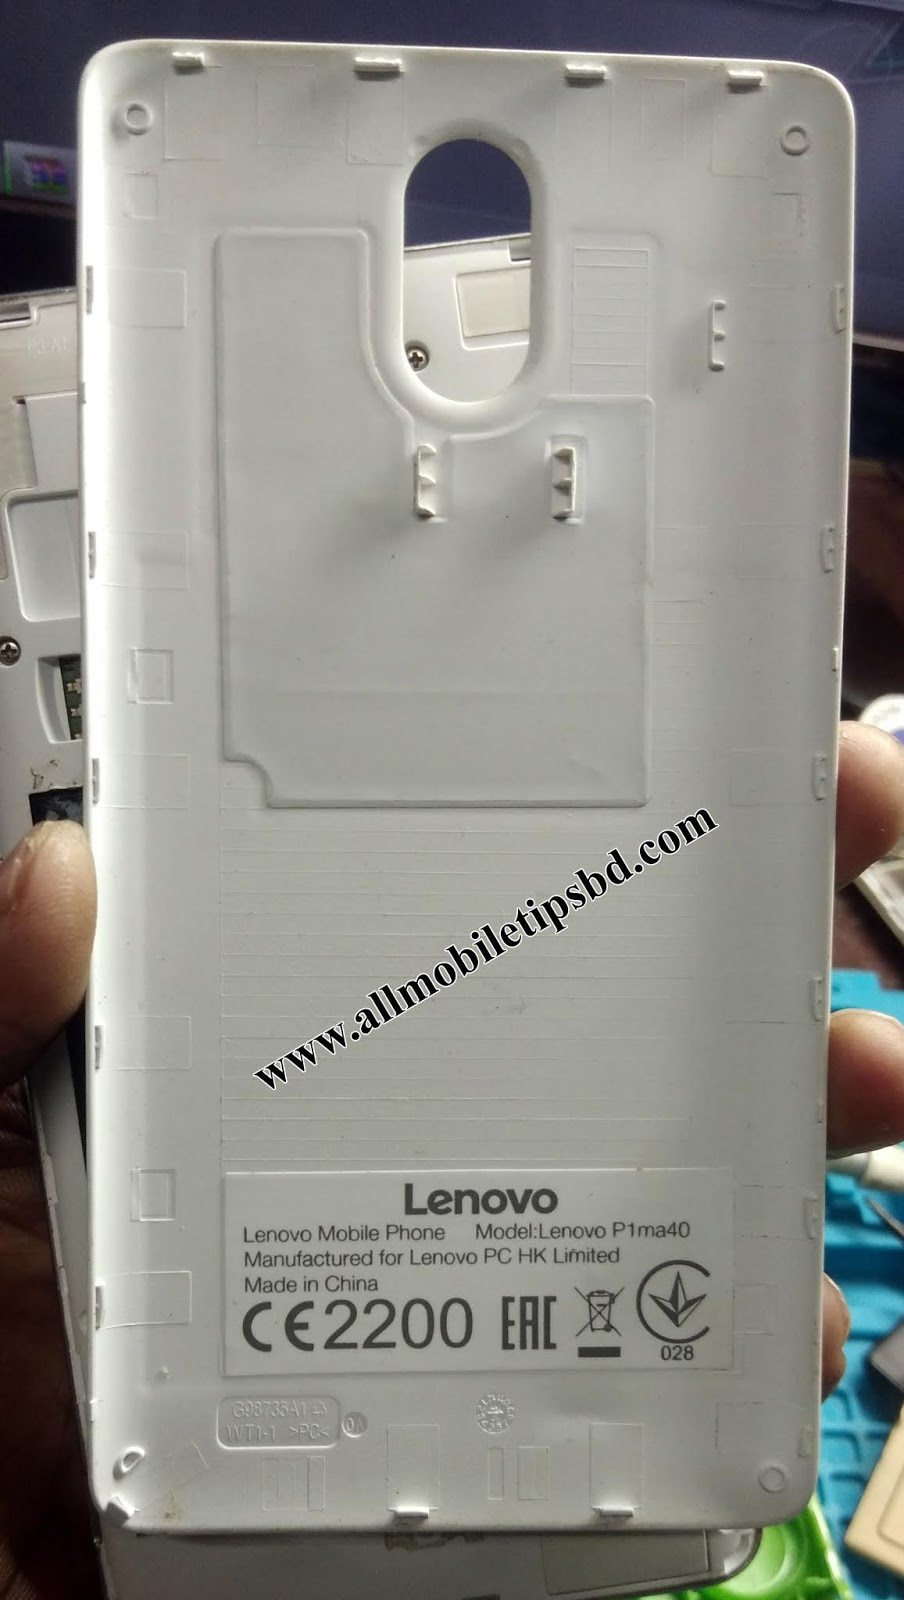 Lenovo P1ma40 Flash File Firmware Hang Logo FRP Dead